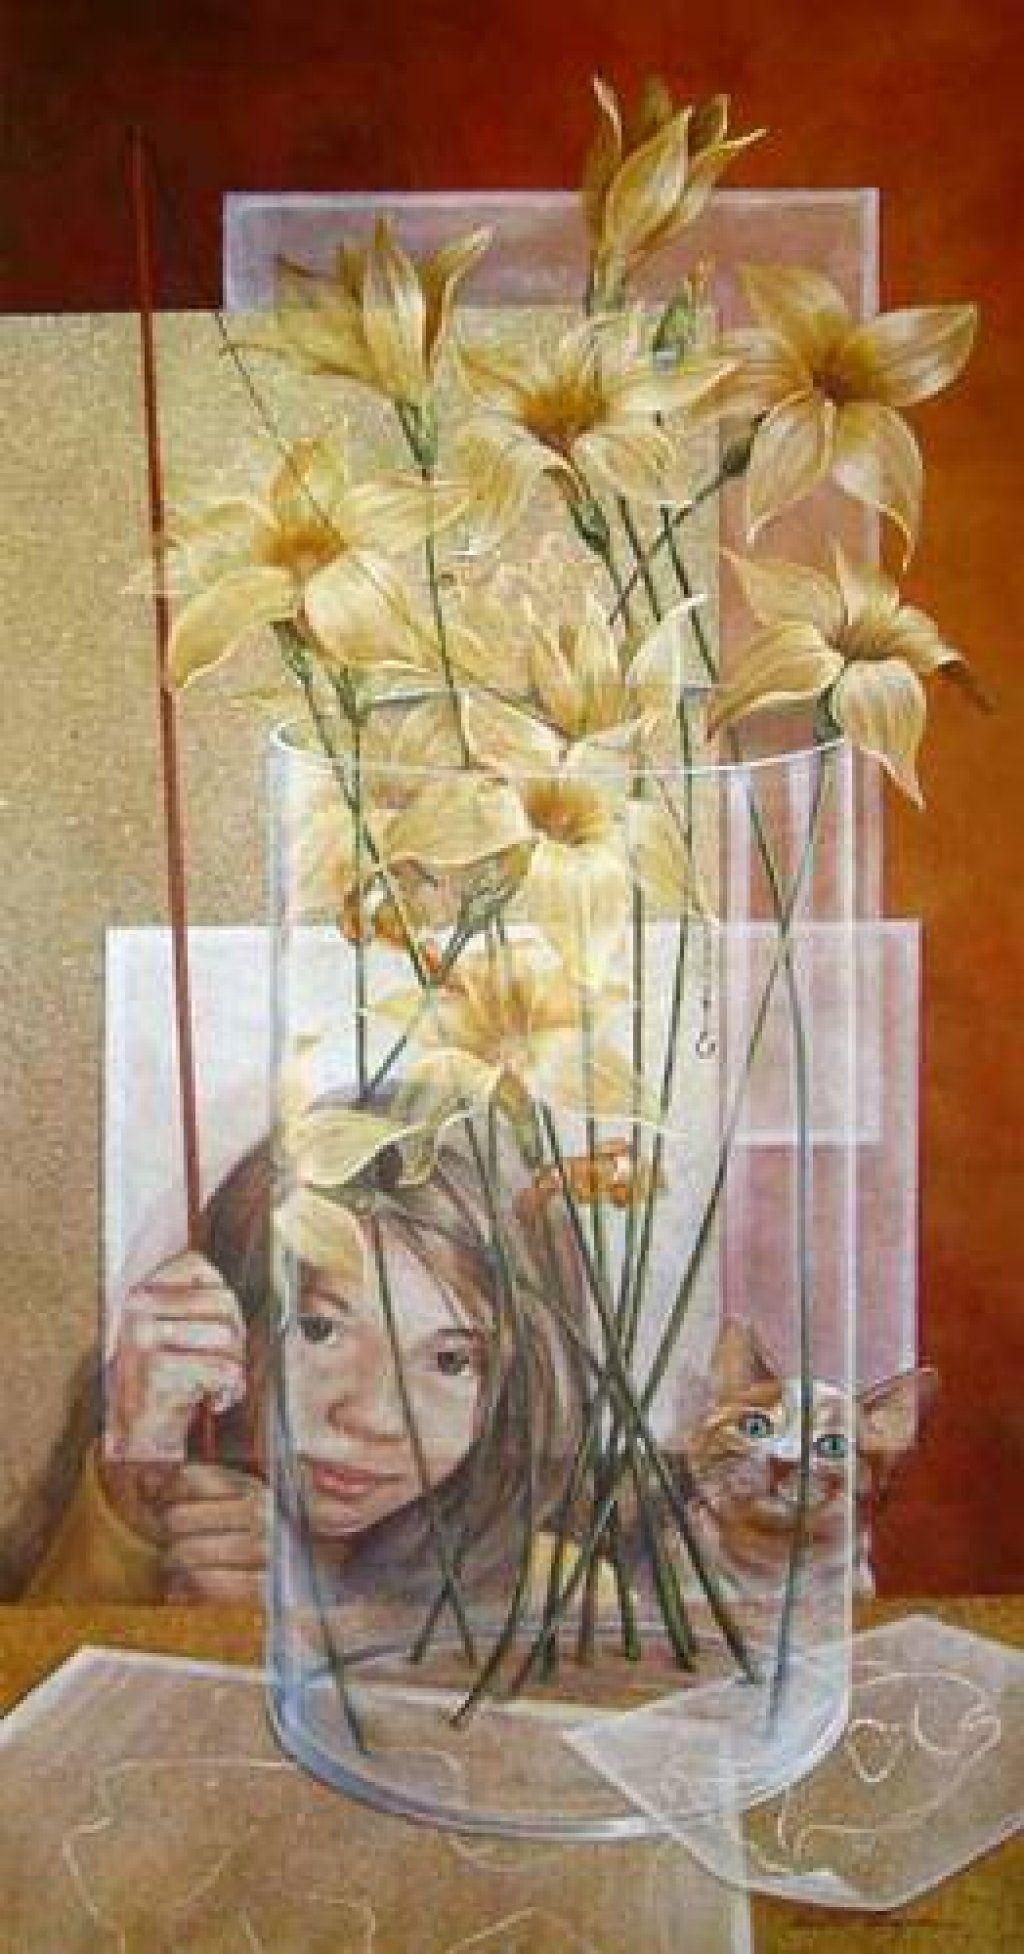 Pin By Leslie Payne On Chelin Sanjuan Surreal Art Surrealism Painting Art